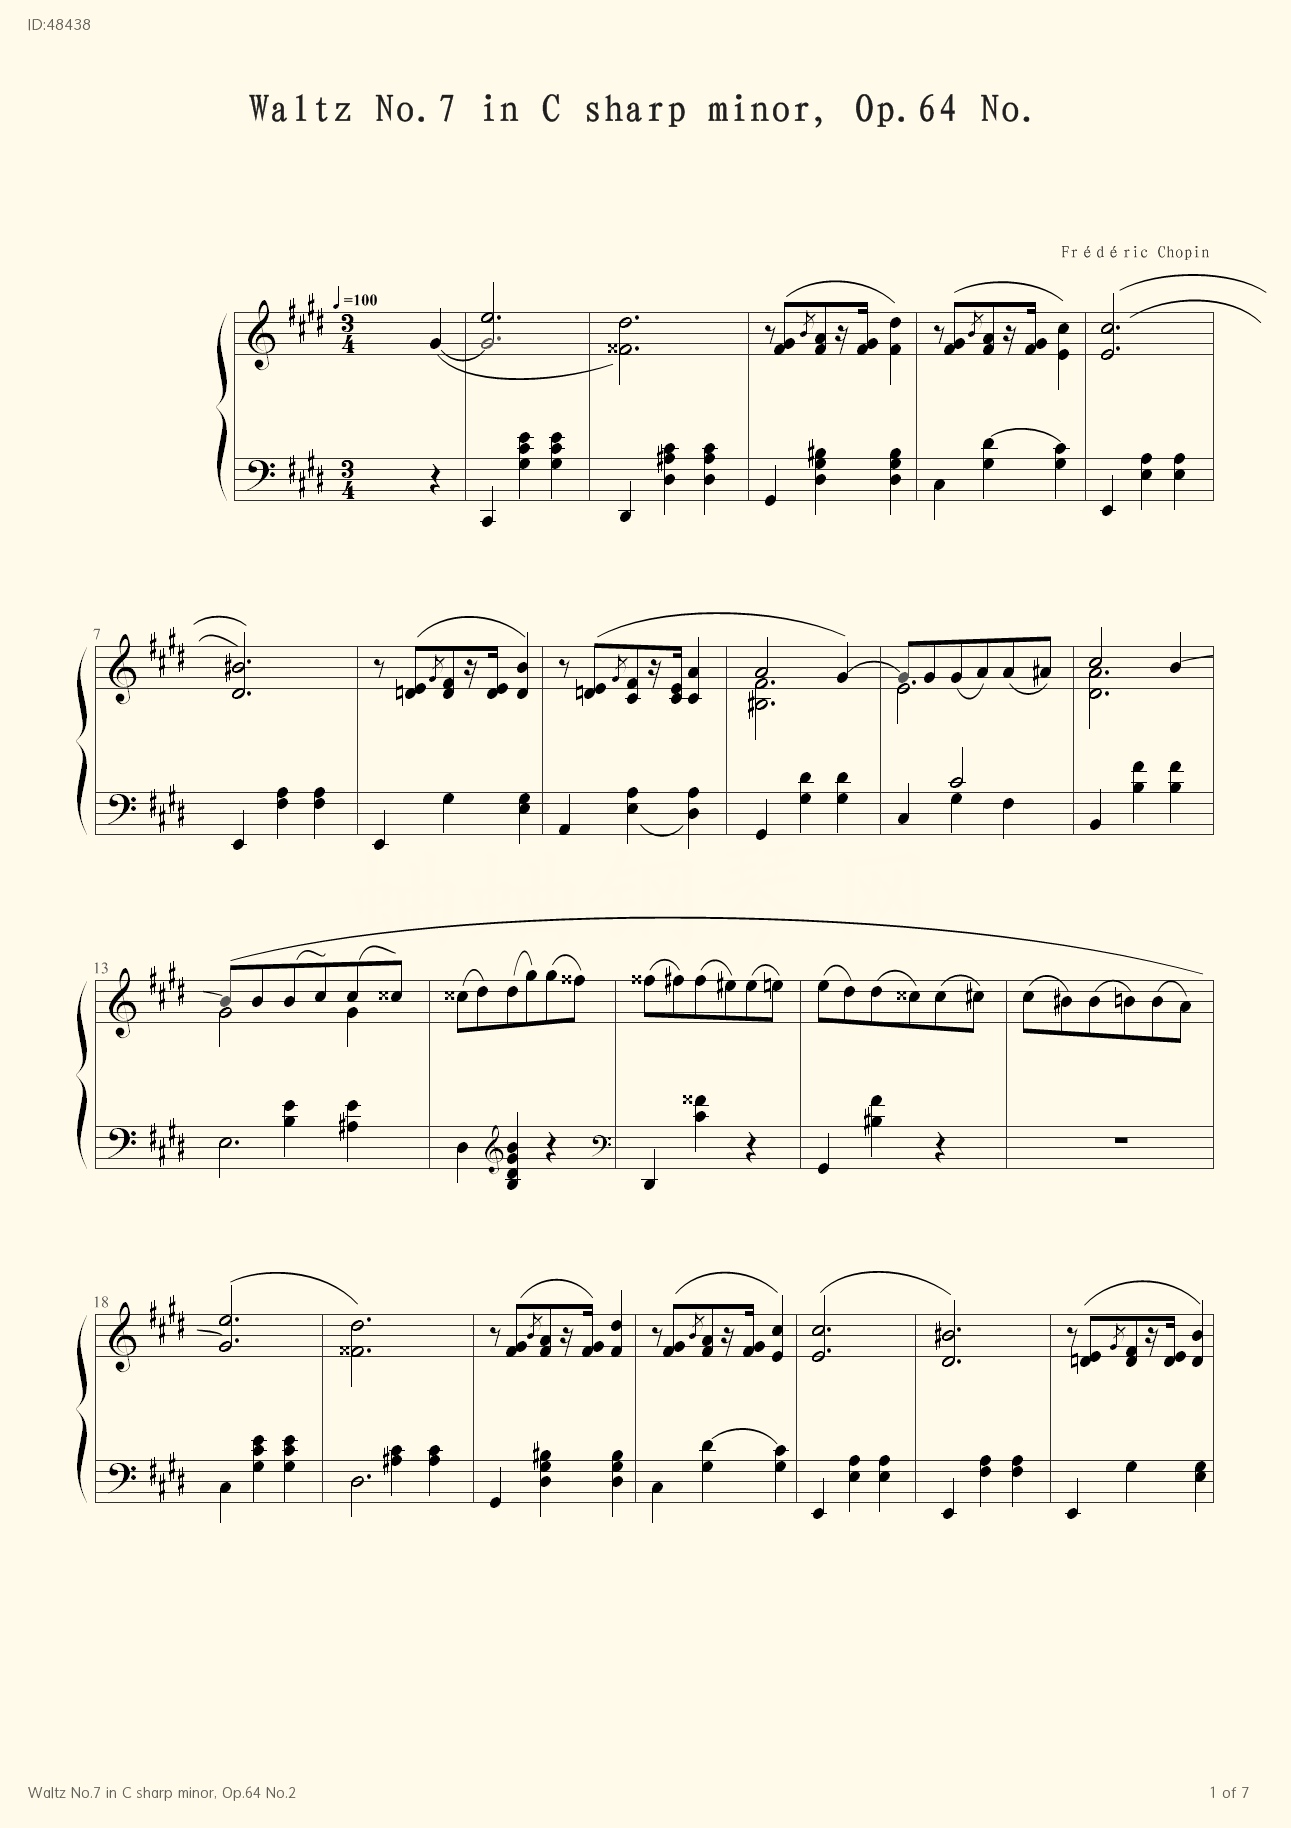 Waltz No.7 in C sharp minor, Op.64 No.2 - Frédéric Chopin - first page